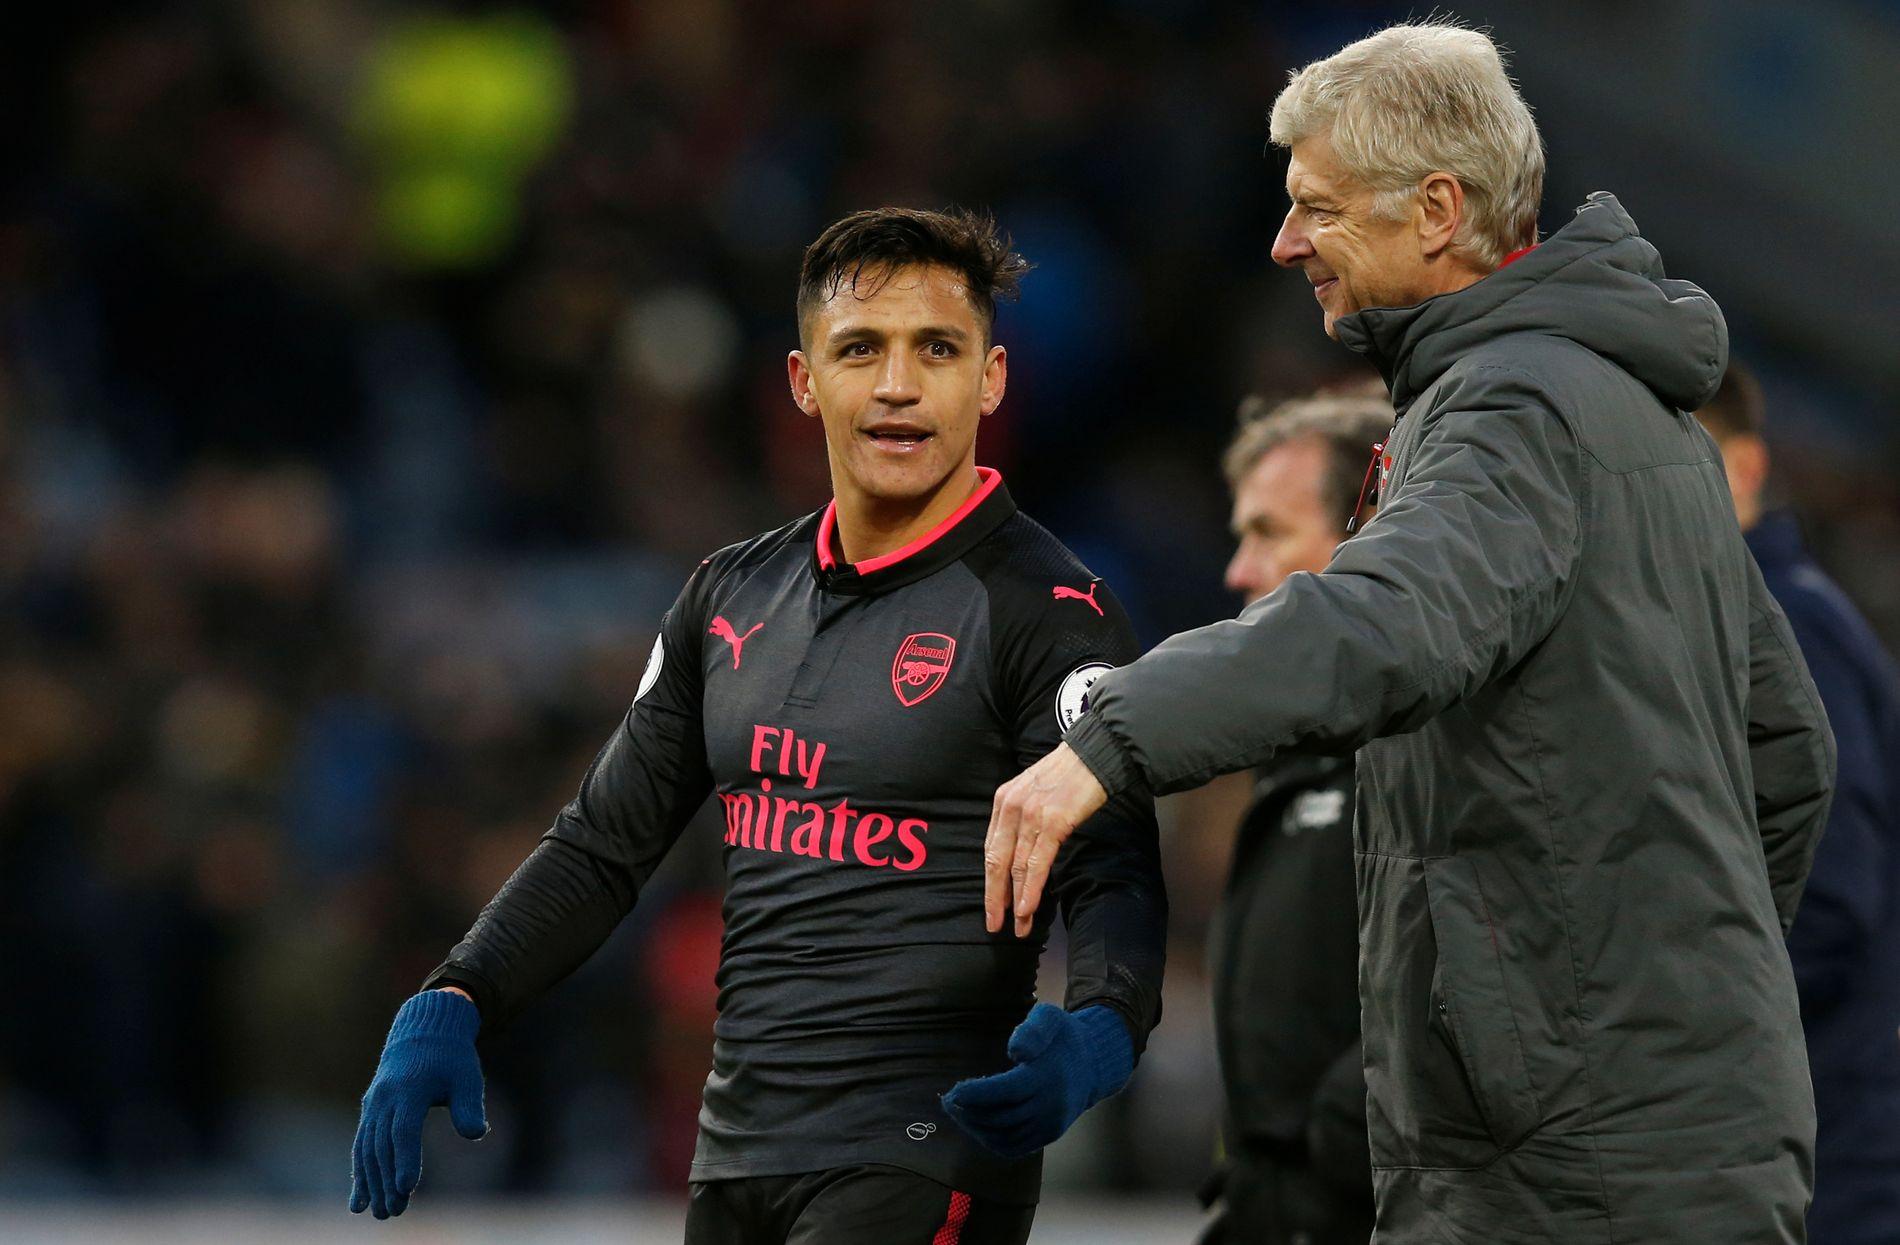 CITY-AKTUELL: Alexis Sánchez er på utgående kontrakt i Arsenal.